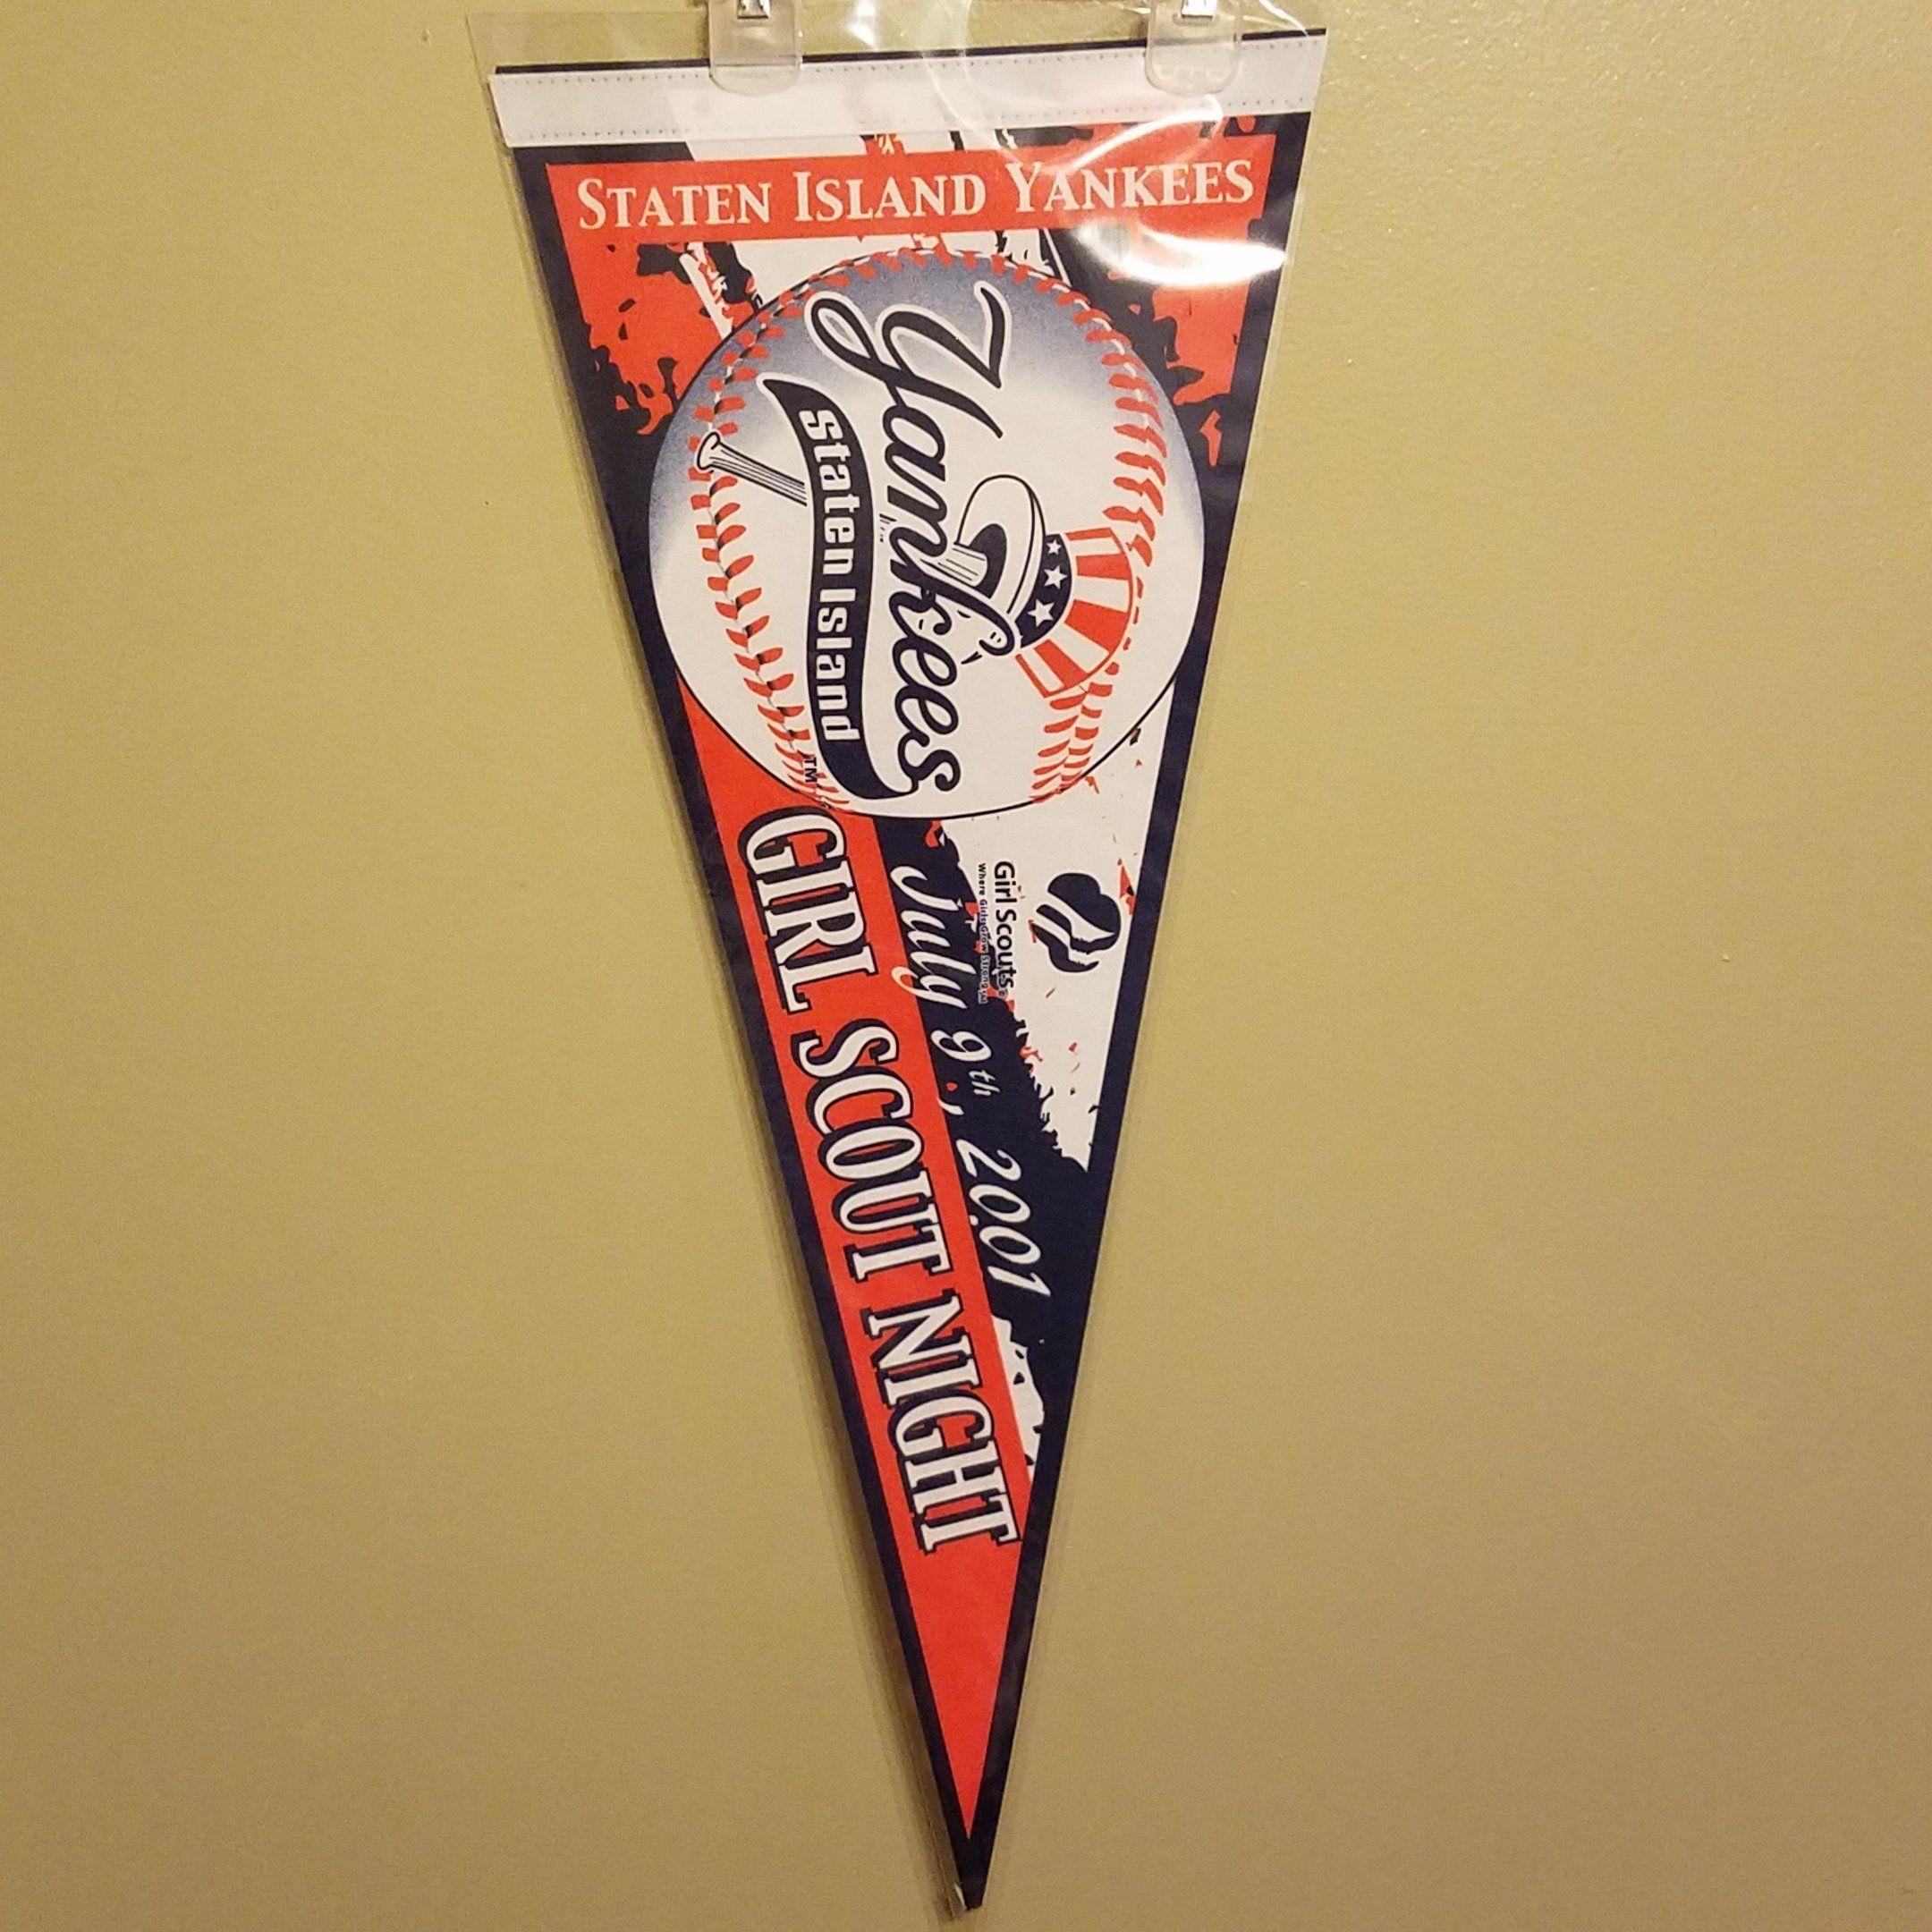 Staten island yankees minor league baseball felt pennant with holder